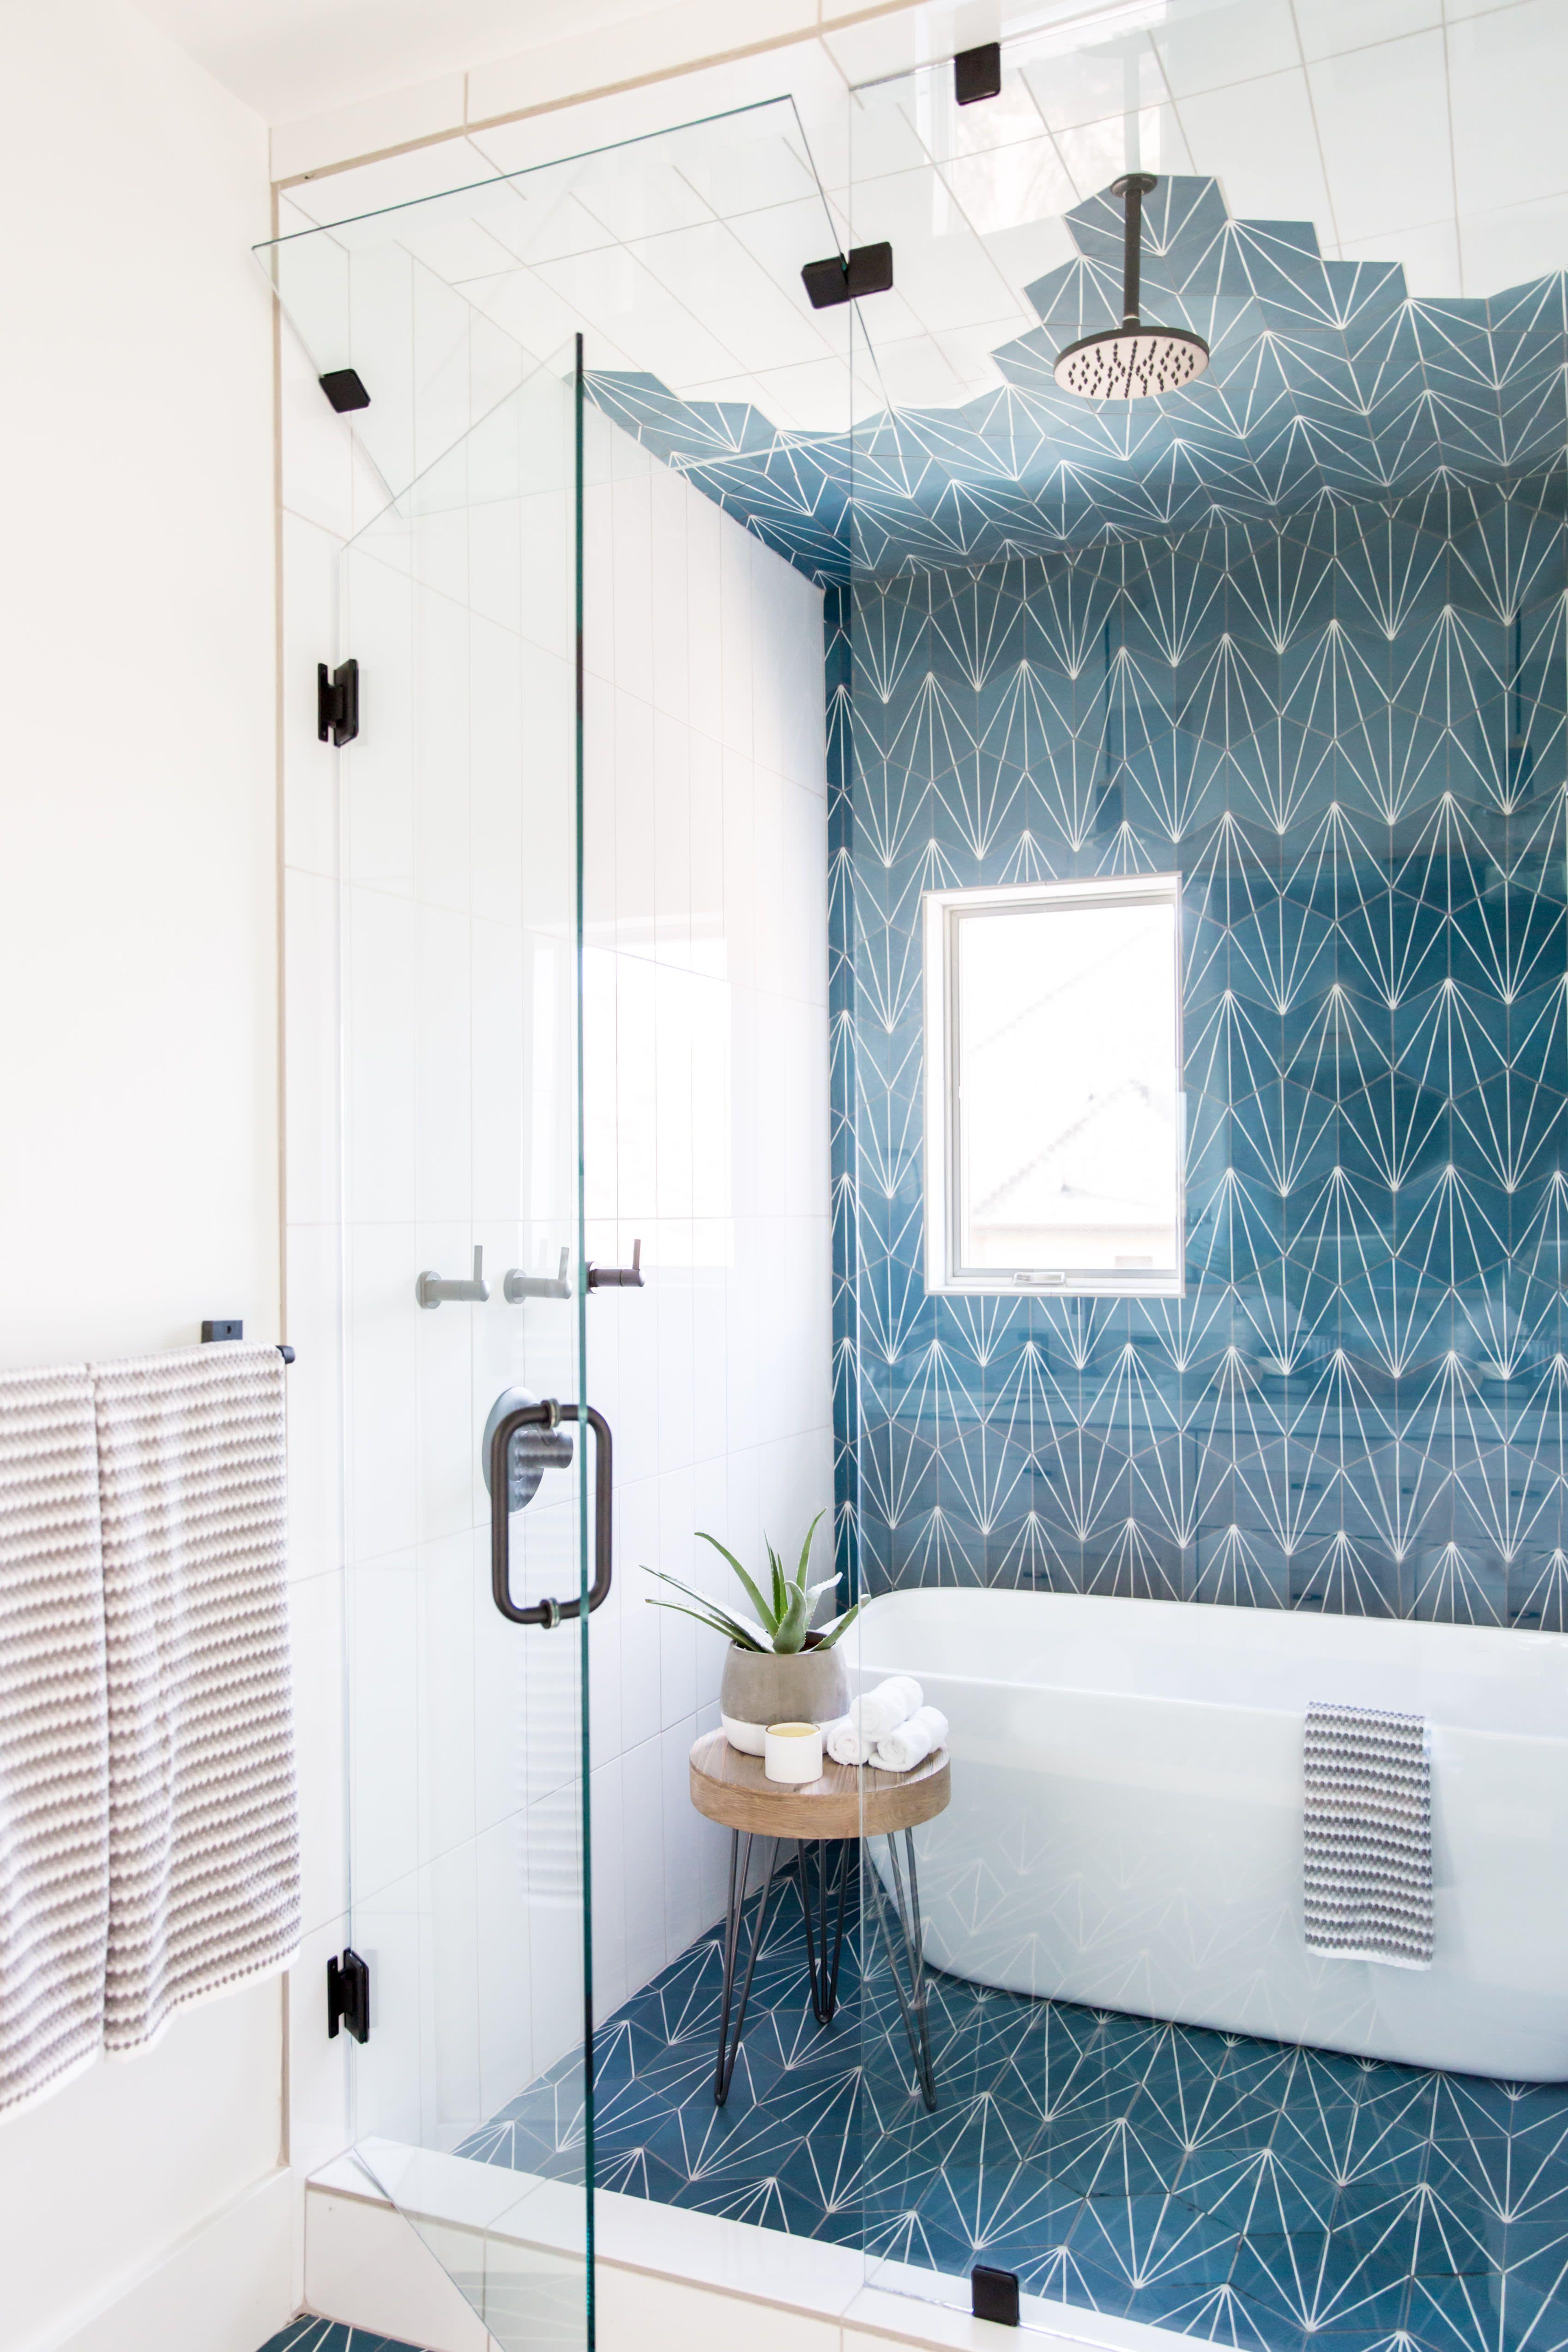 This Vibrant Jack And Jill Kids Bathroom Is Made For Sharing Bathroom Interior Design Bathroom Design Bathroom Interior